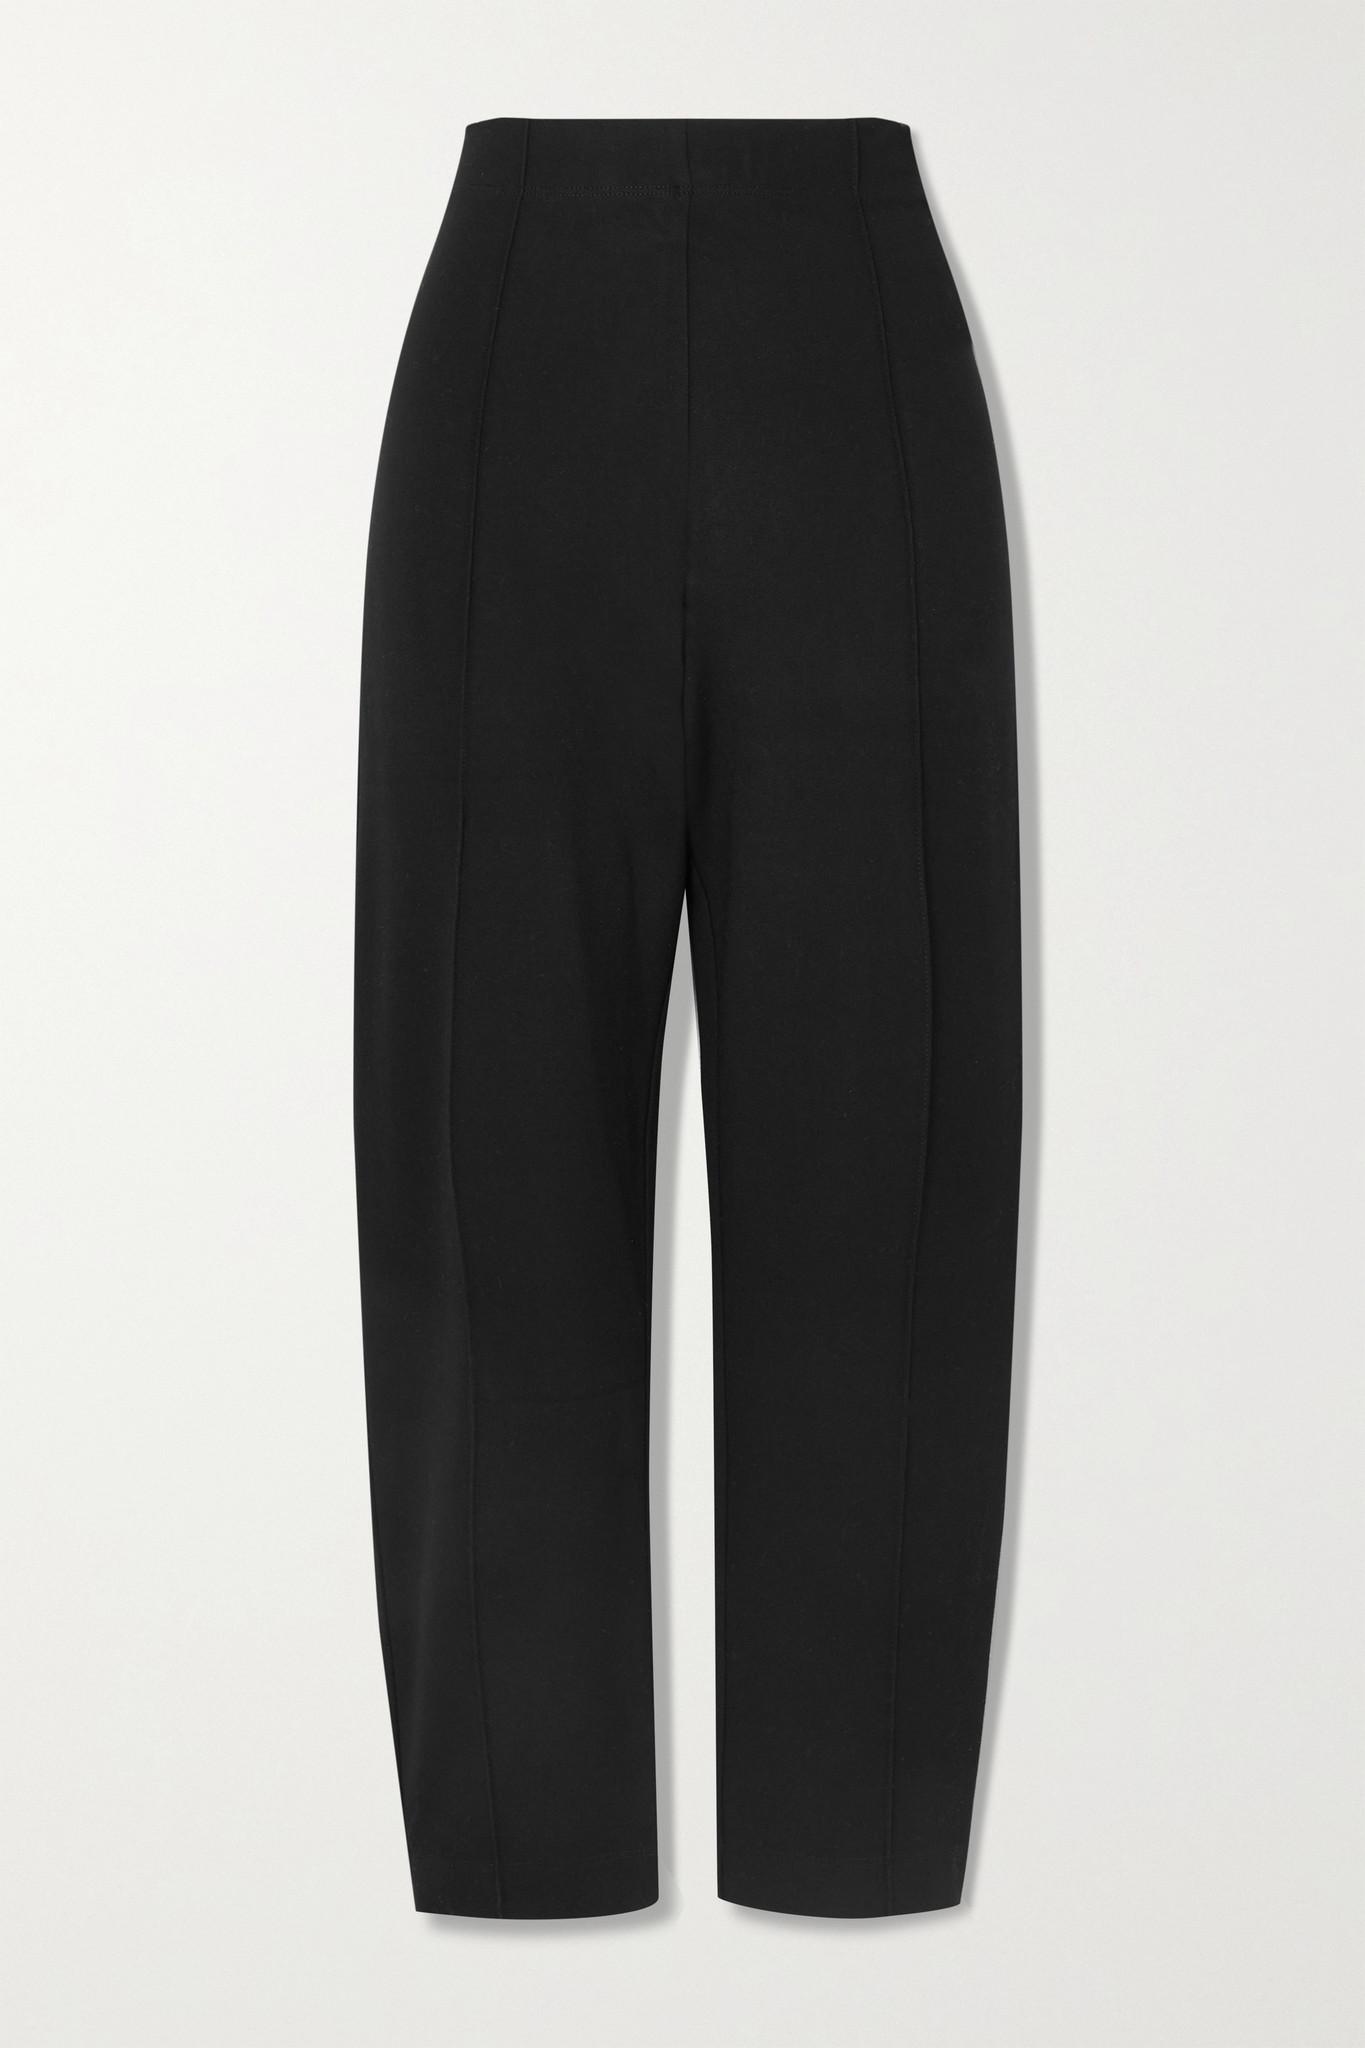 LESET - Rio Cropped Straight-leg Stretch-ponte Pants - Black - medium